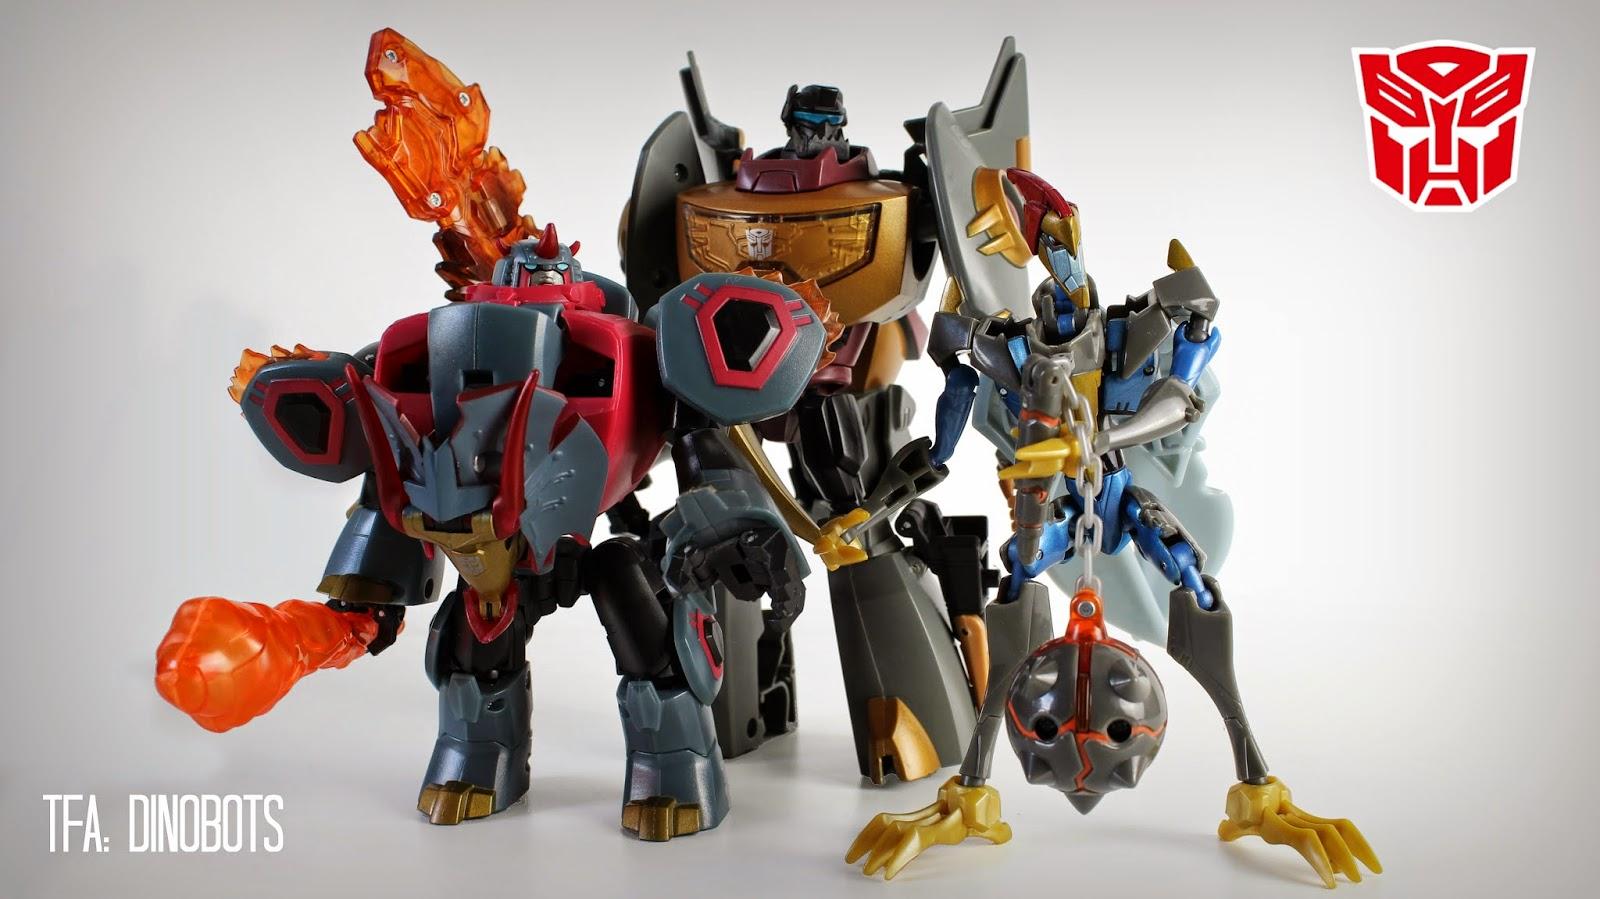 Transformers Animated Dinobots Grimlock Snarl Slag Swoop Autobots Hasbro Takara Toys Action Figures